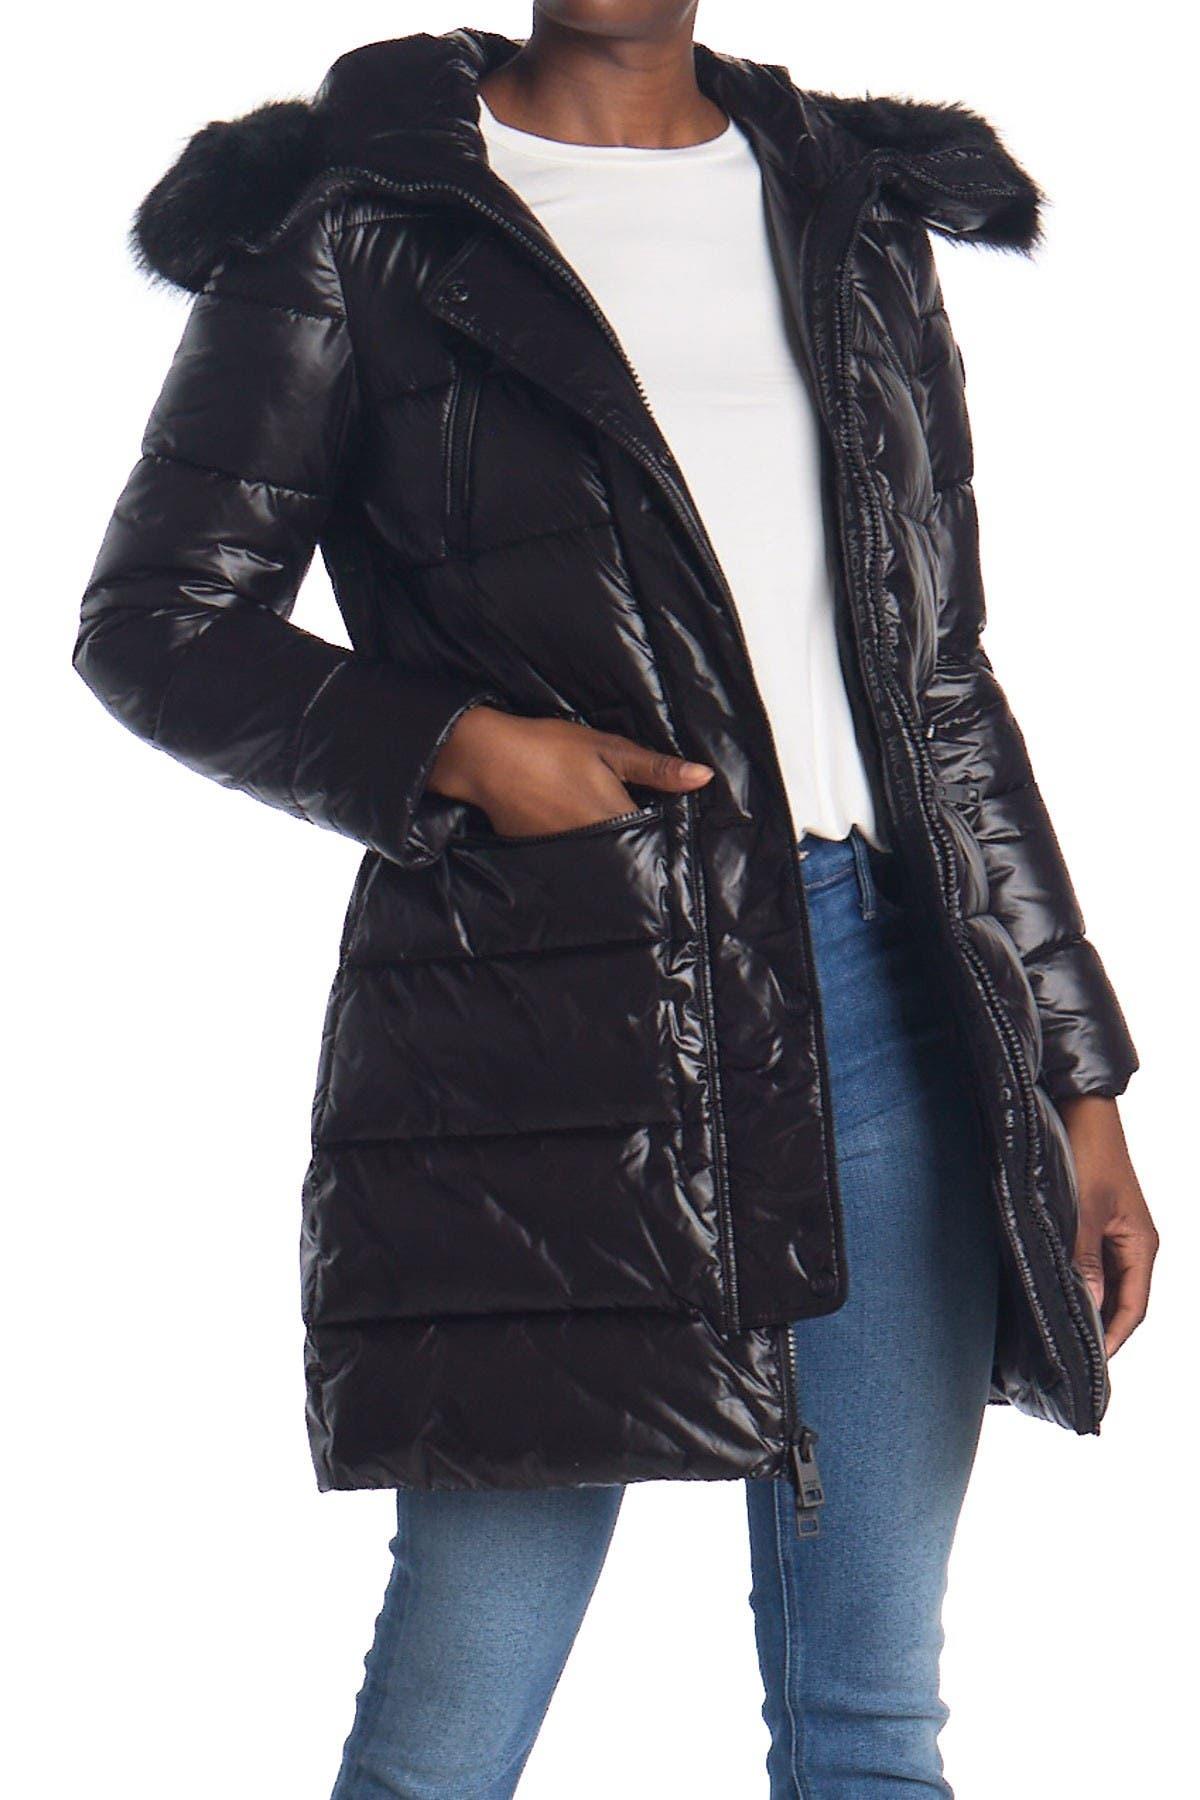 Image of Michael Kors Belted Faux Fur Hooded Jacket